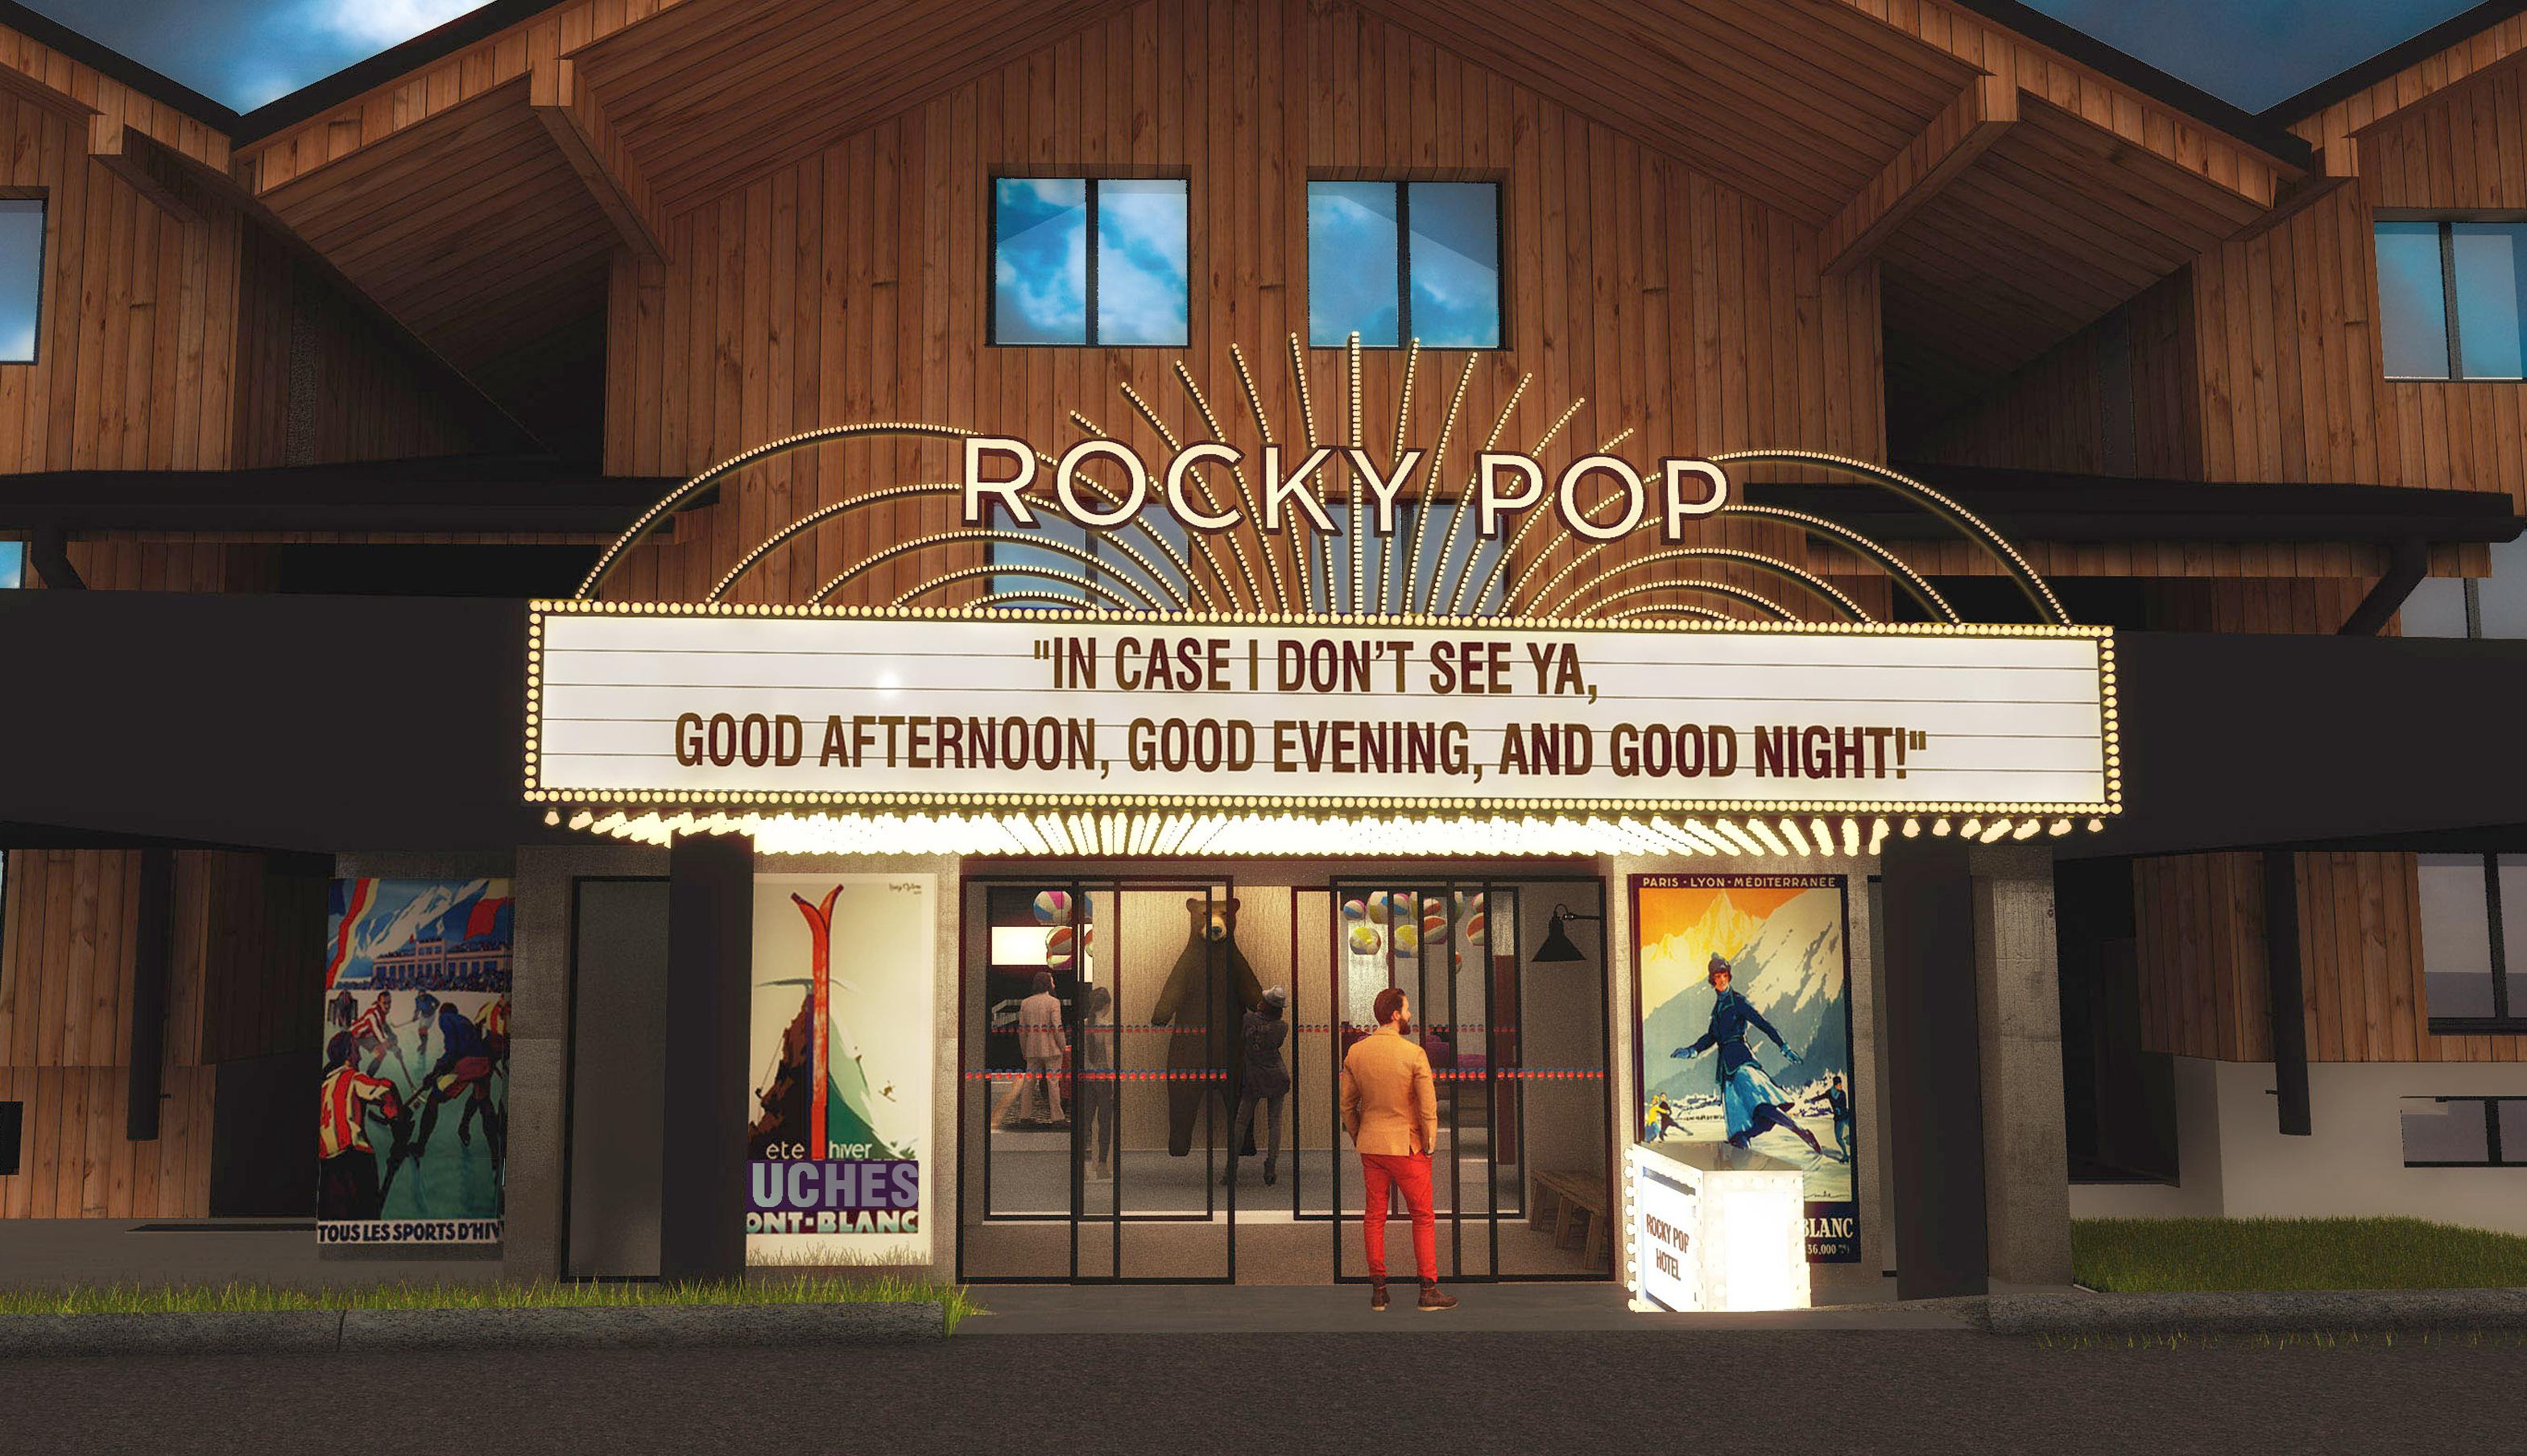 RockyPop